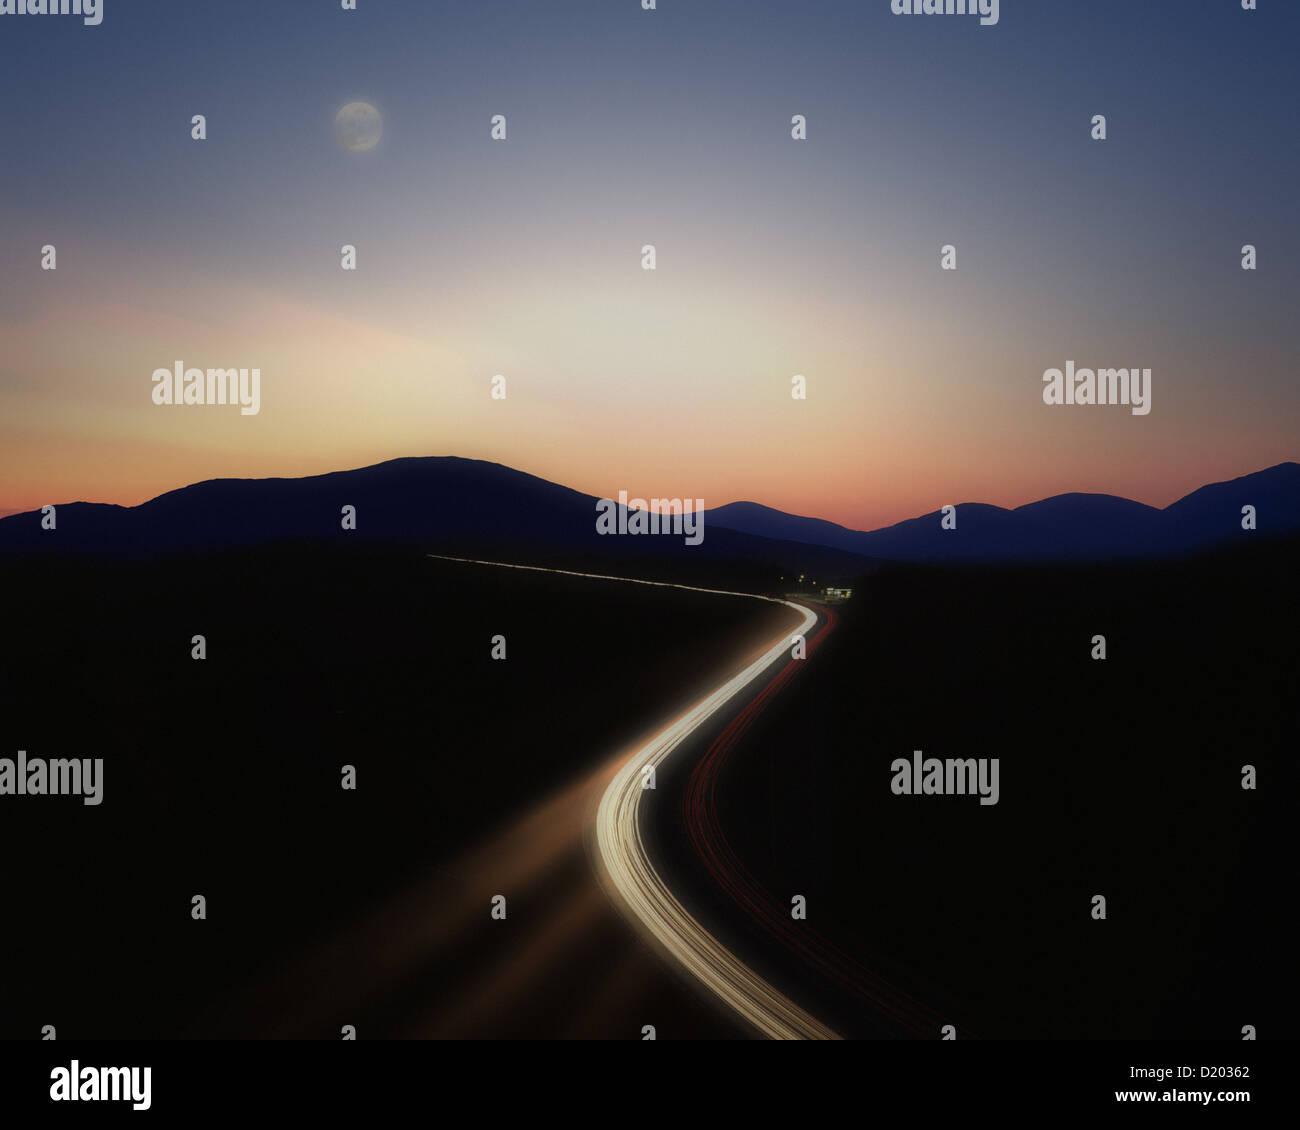 DE - Bayern: Autobahn bei Nacht (Verkehrskonzept) Stockbild